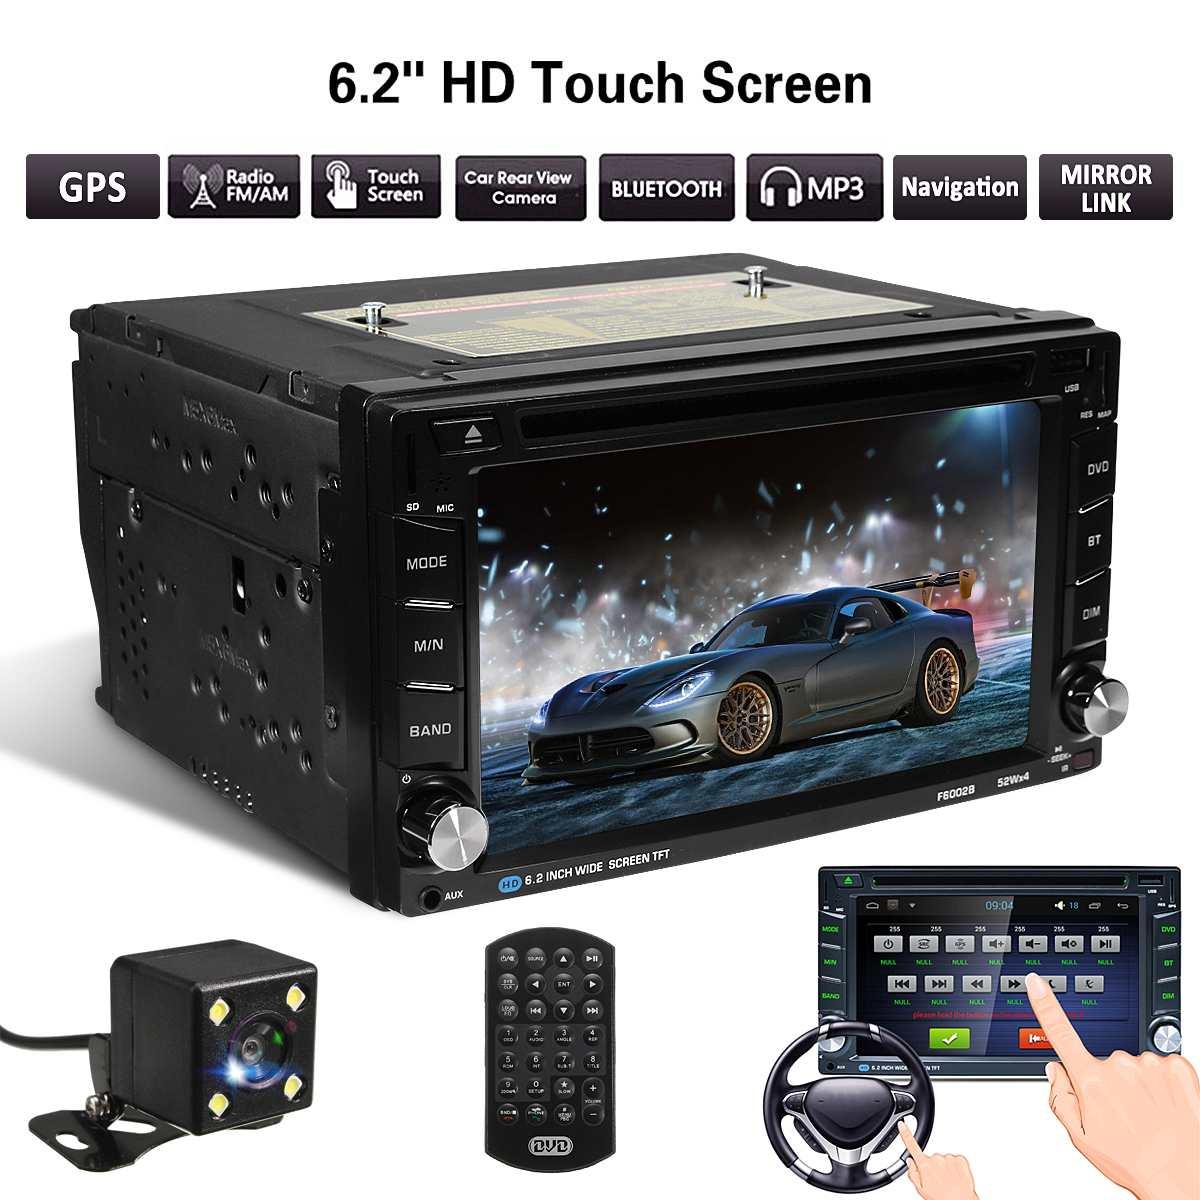 1080 P HD Multi-touch экран для Android WiFi Bluettooth автомобиль DVD FM AM радио gps MP5 плеер высокого качества